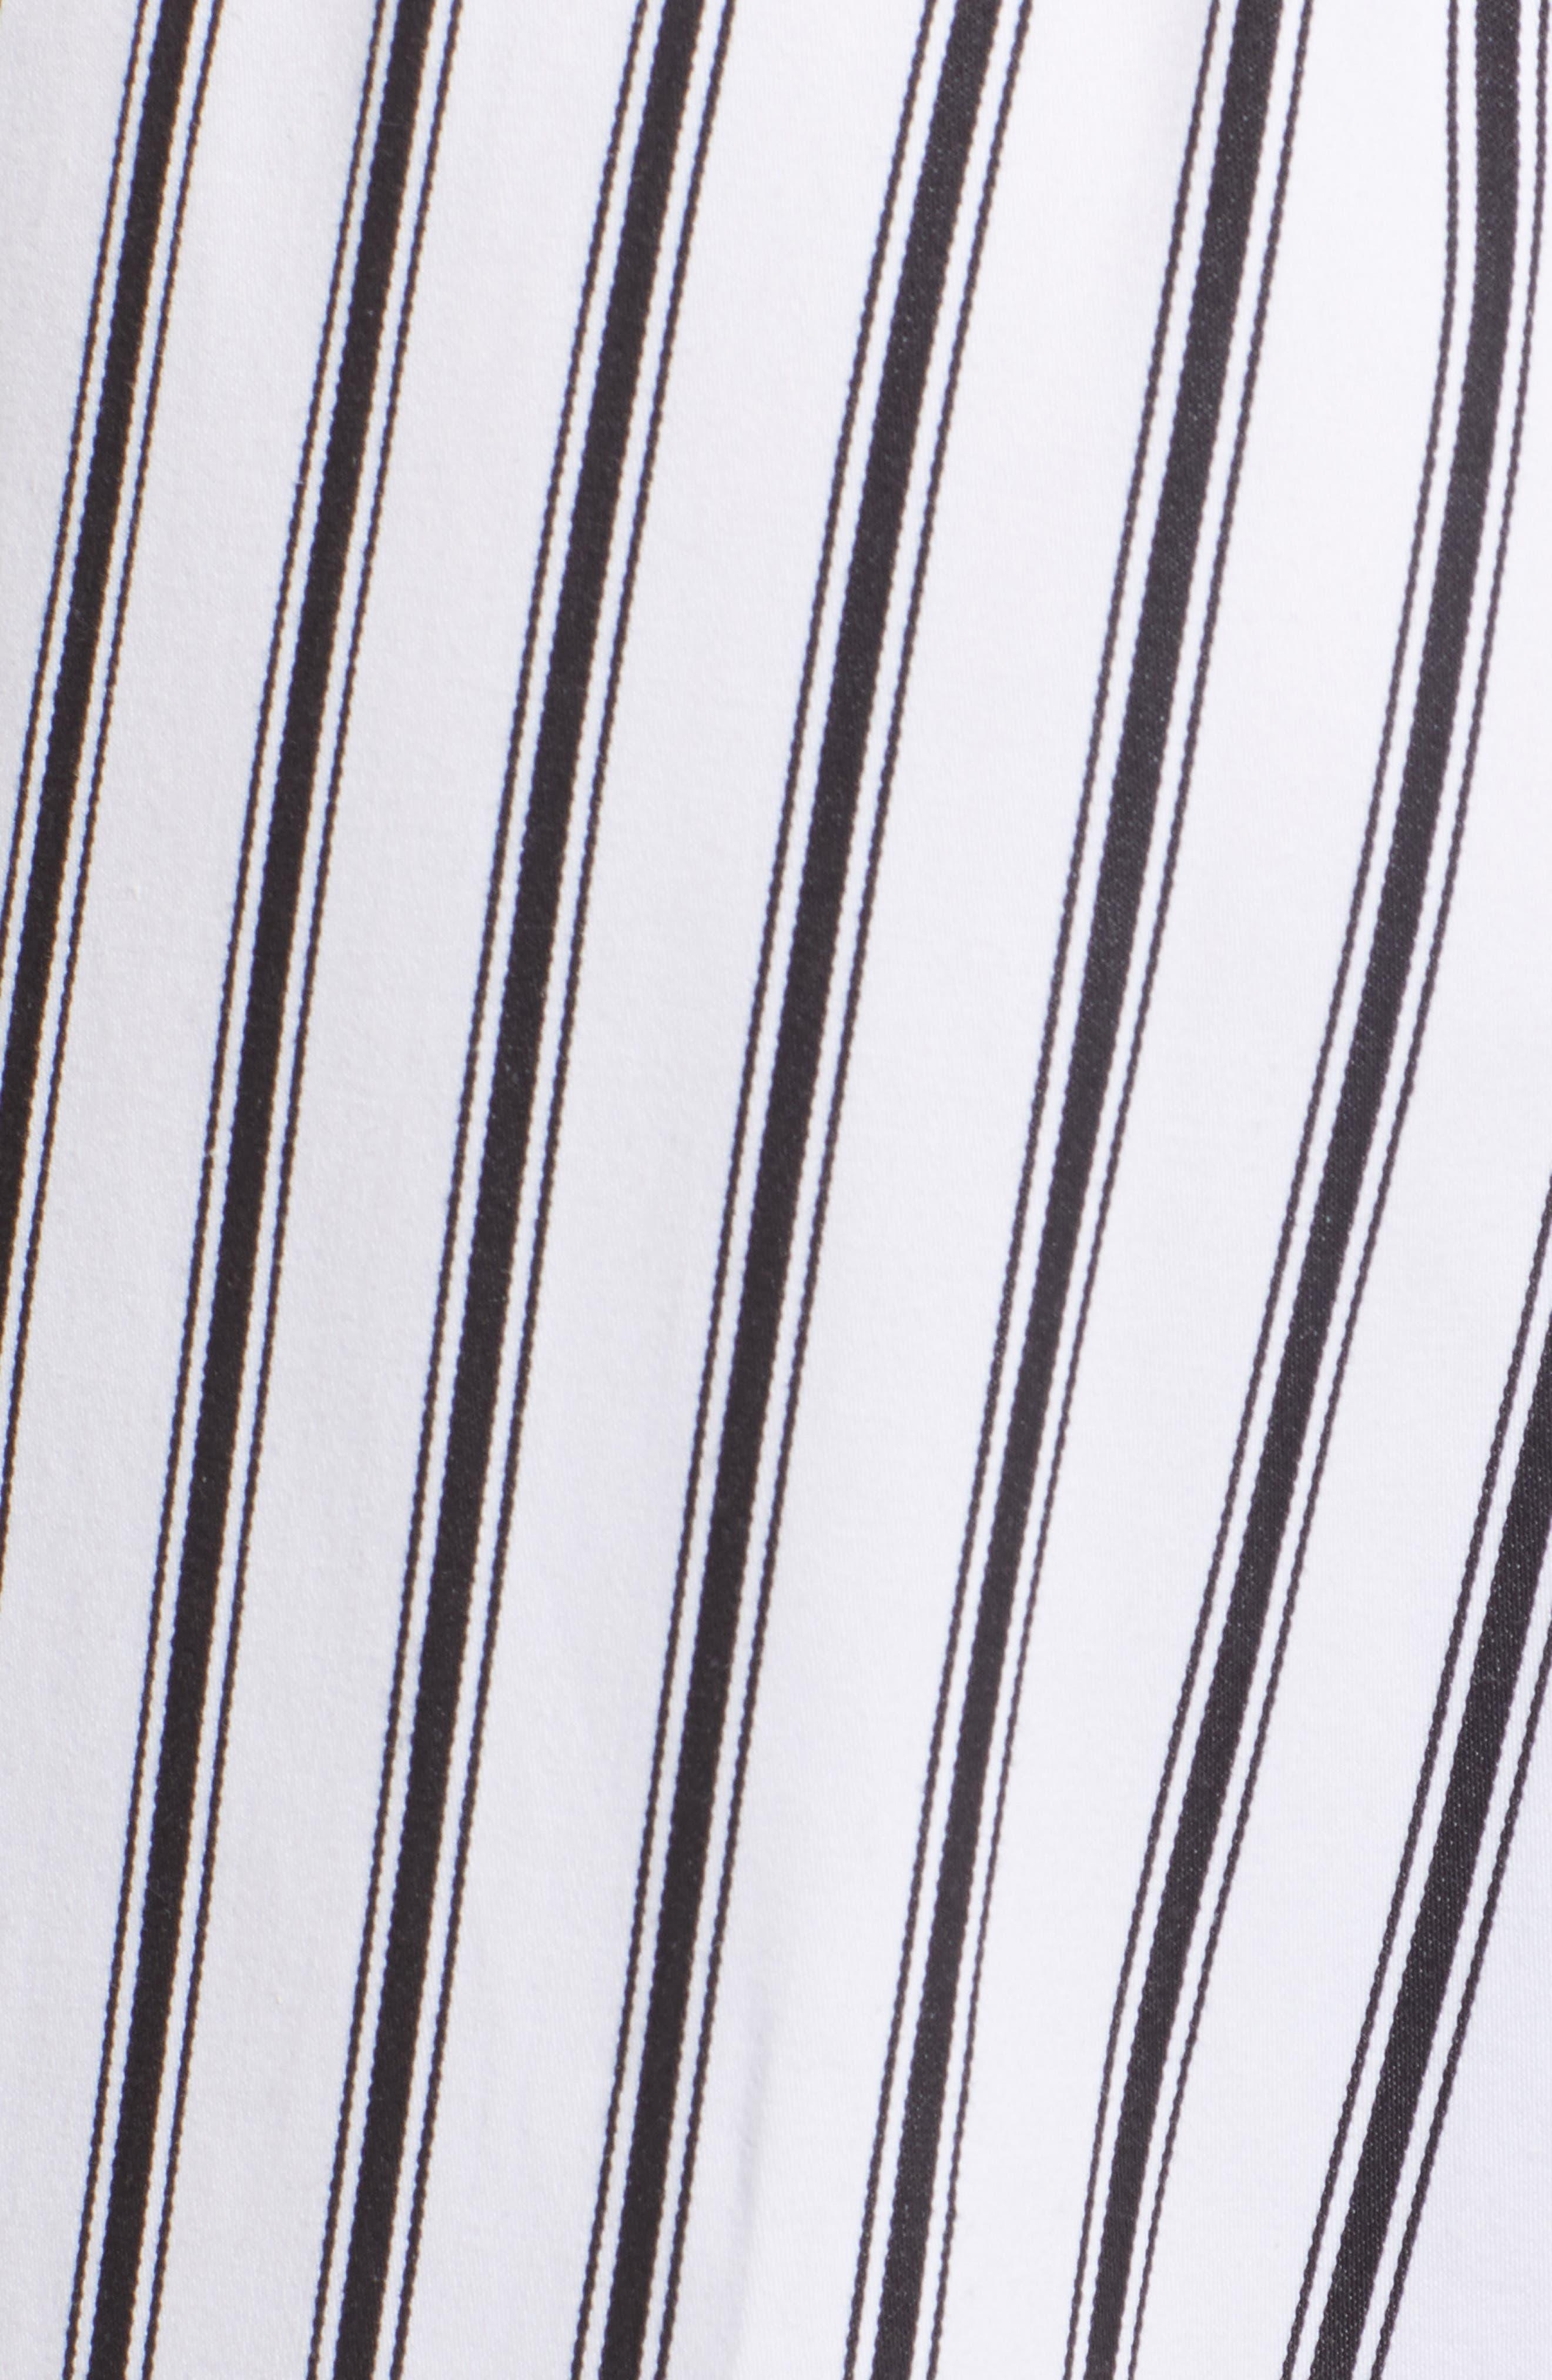 High Waist Convertible Wide Leg Pants,                             Alternate thumbnail 6, color,                             Black/ White Striped